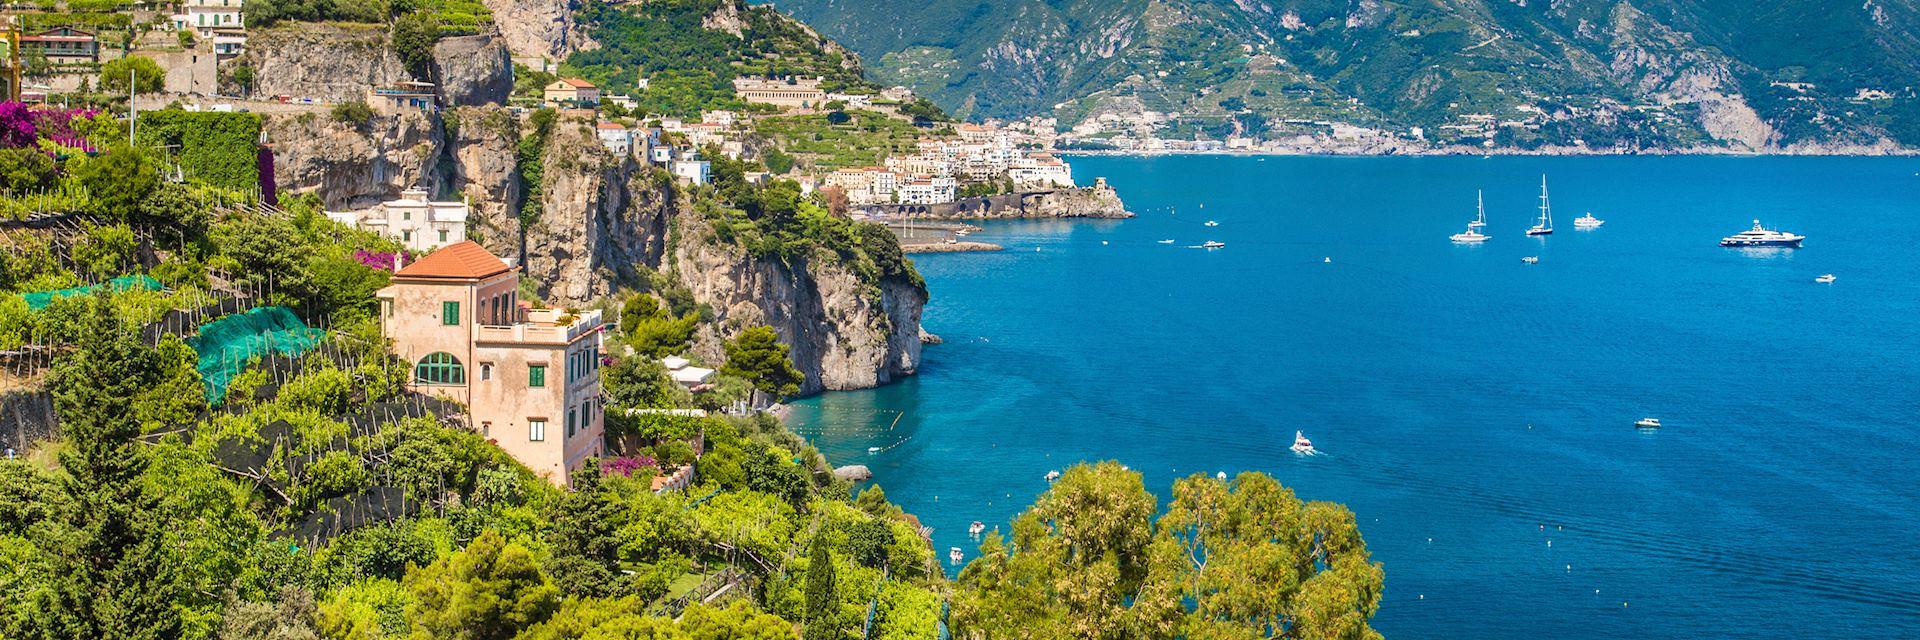 Capri on the Amalfi Coast, Italy